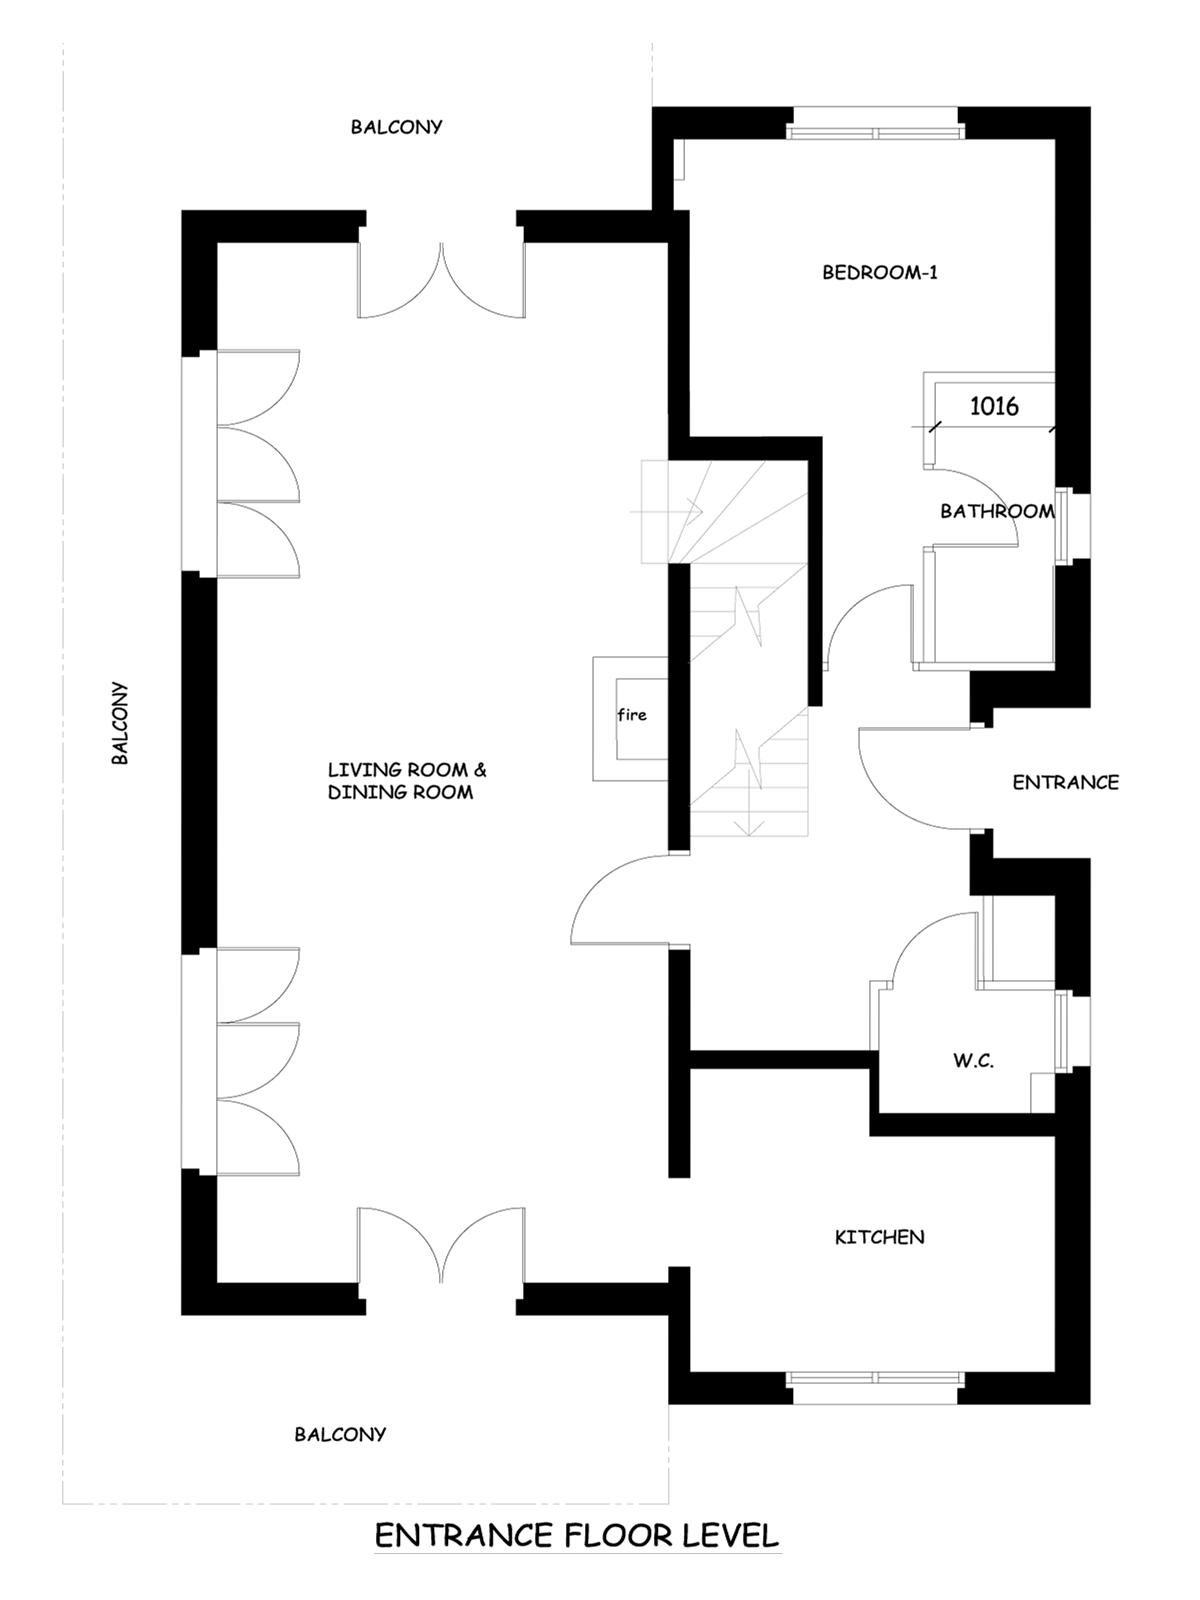 Marvelous Ski Chalet Floor Plans Part - 8: Basement Plan Lower Floor Plan Entrance Floor Plan ...